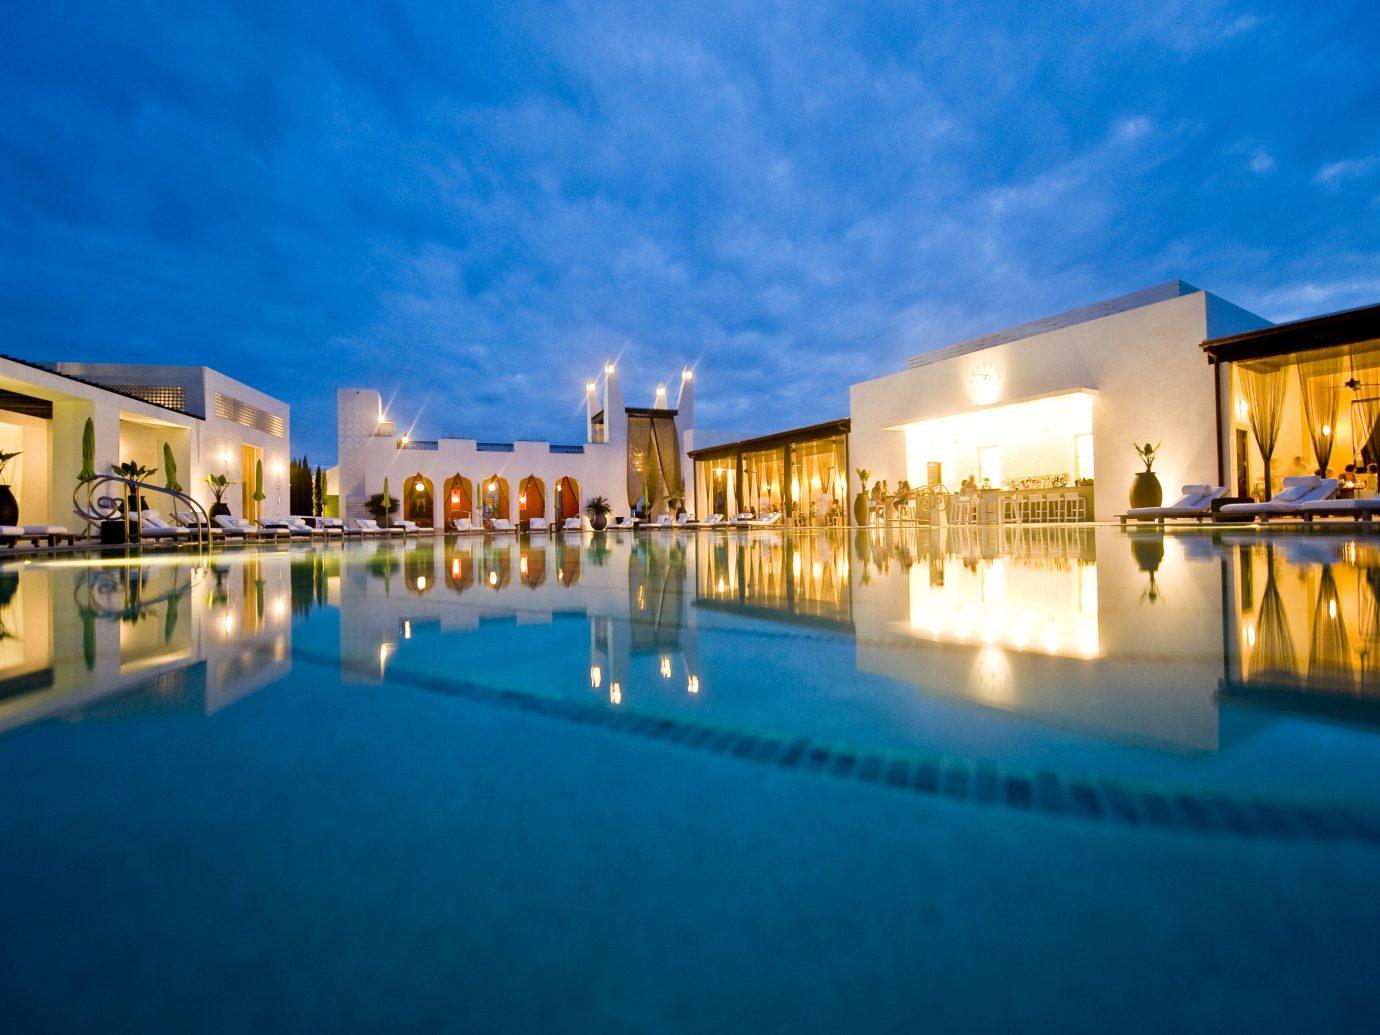 Beach sky leisure swimming pool Resort estate night scene vacation reflection plaza palace blue